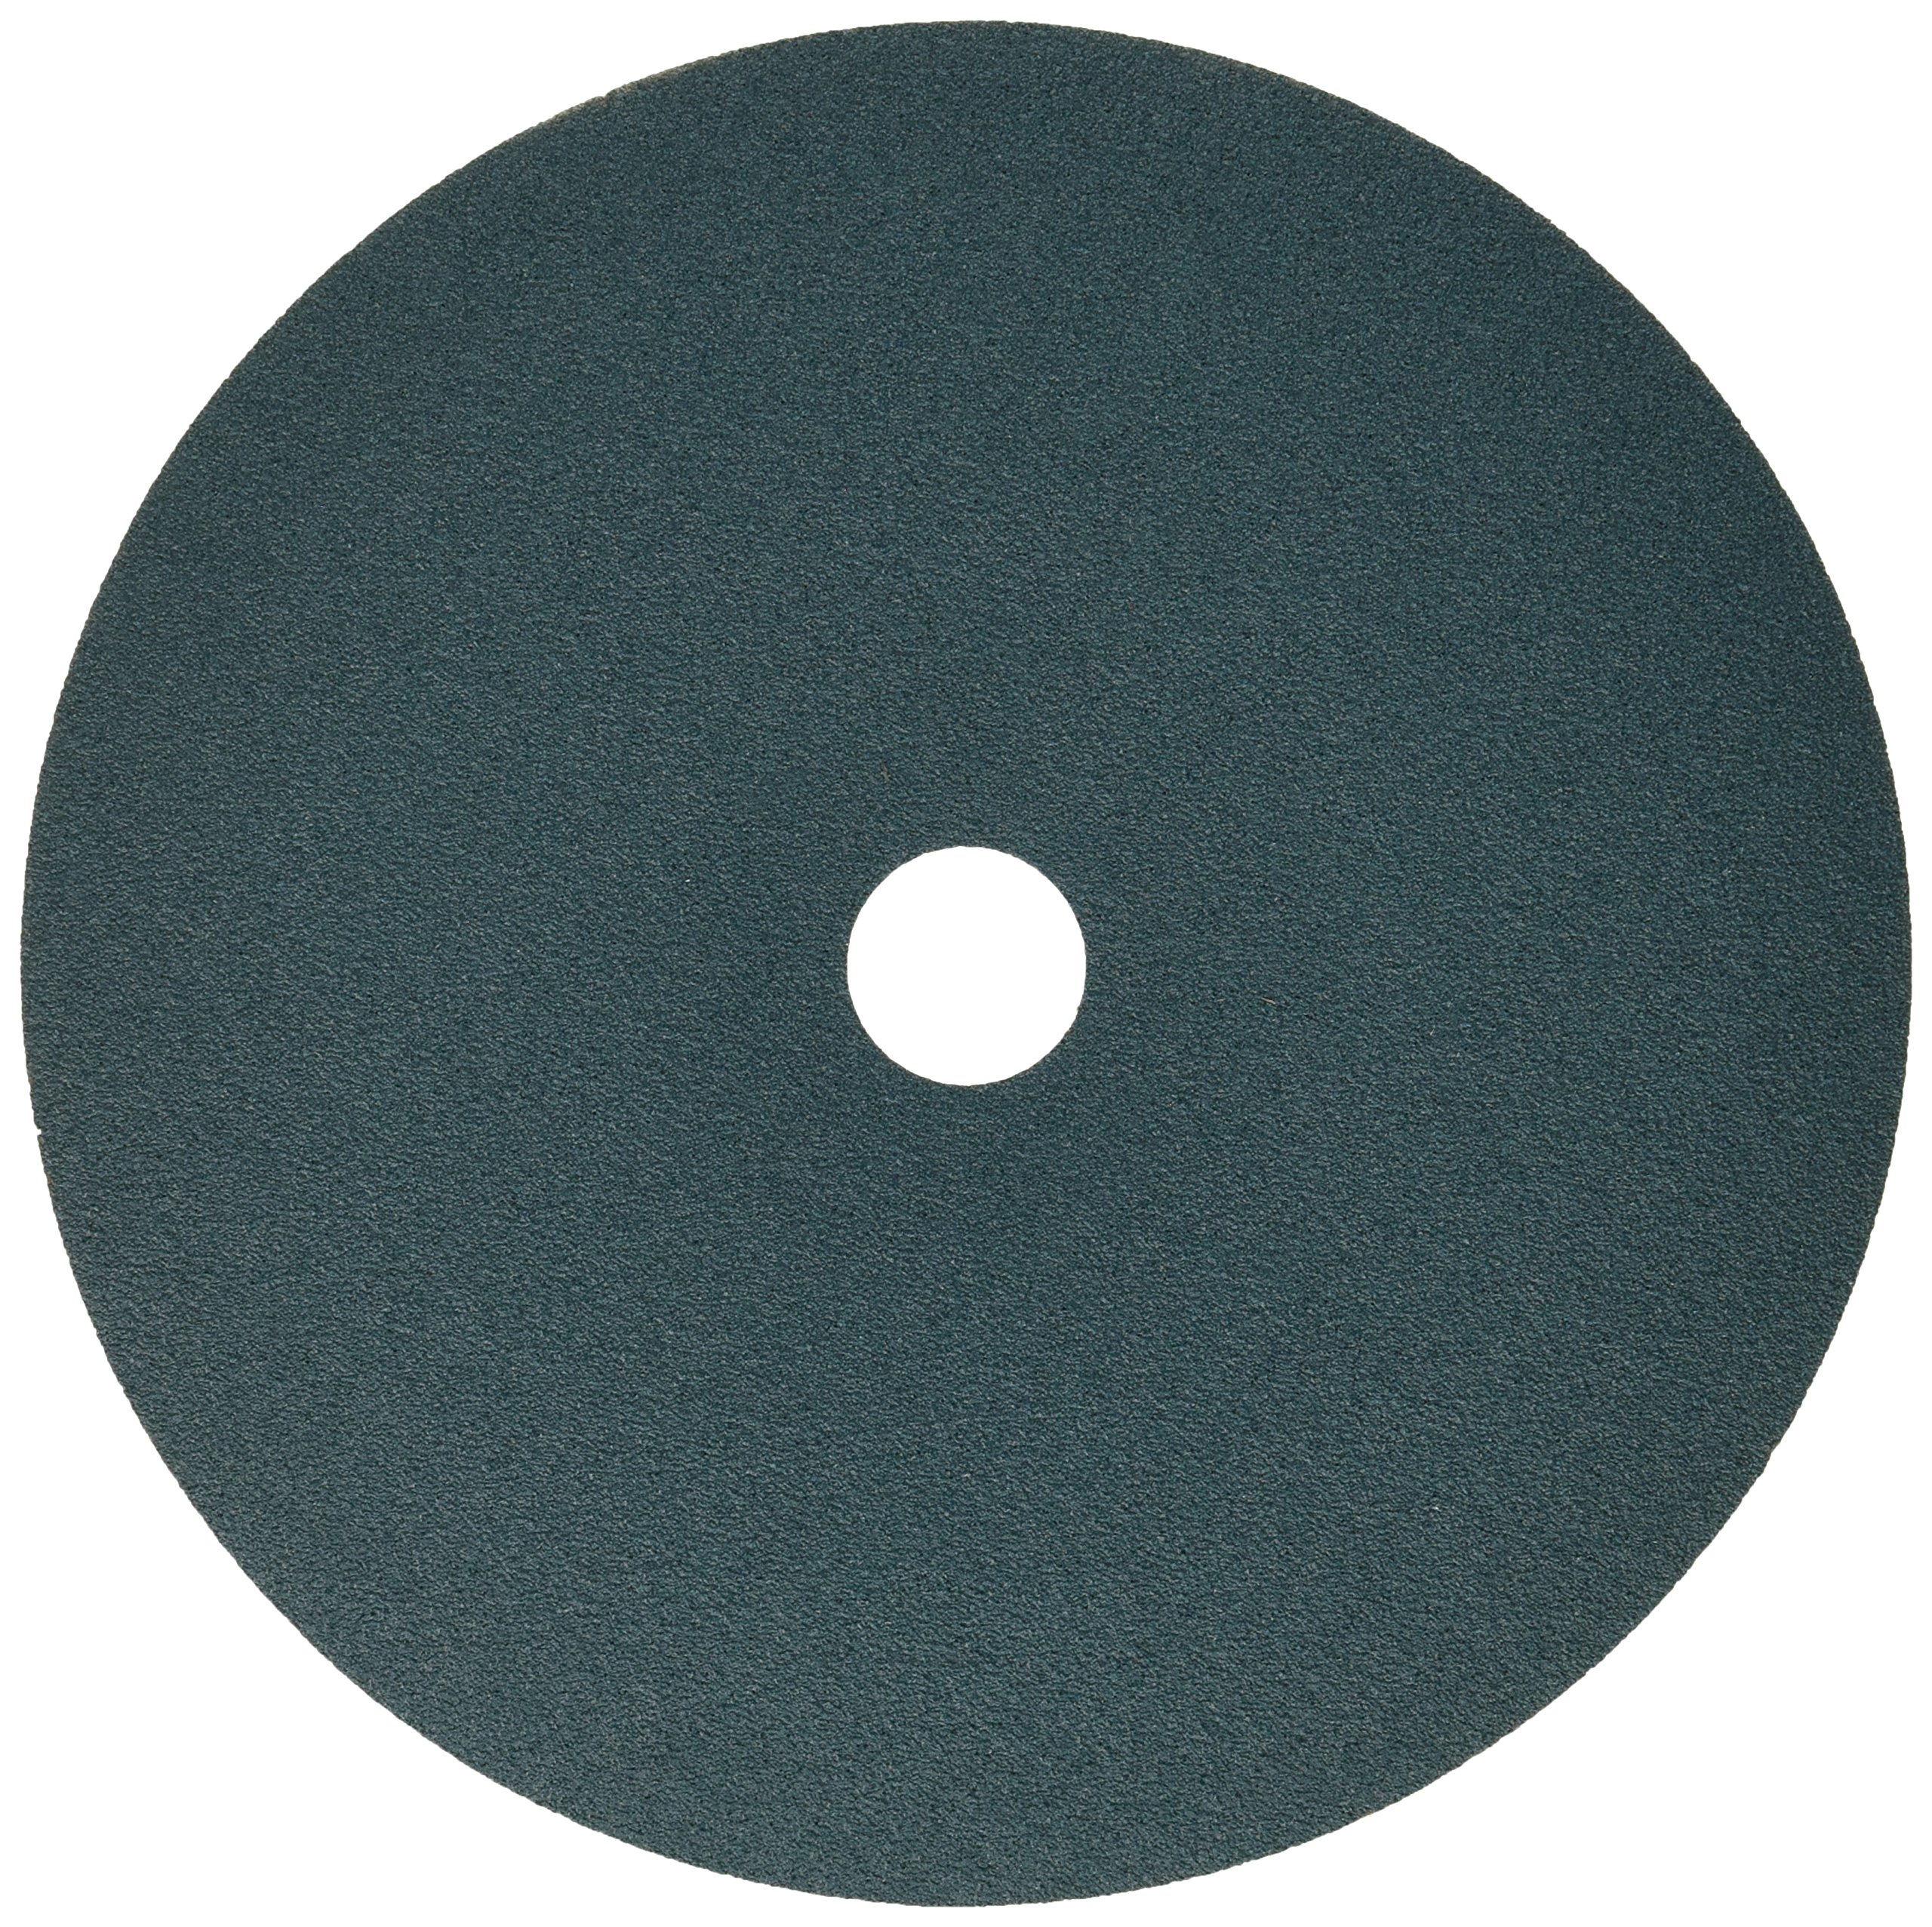 United Abrasives-SAIT 57780 Ceramic Fiber Disc, 7S 7 X 7/8, 80 Grit, 100 Per Box